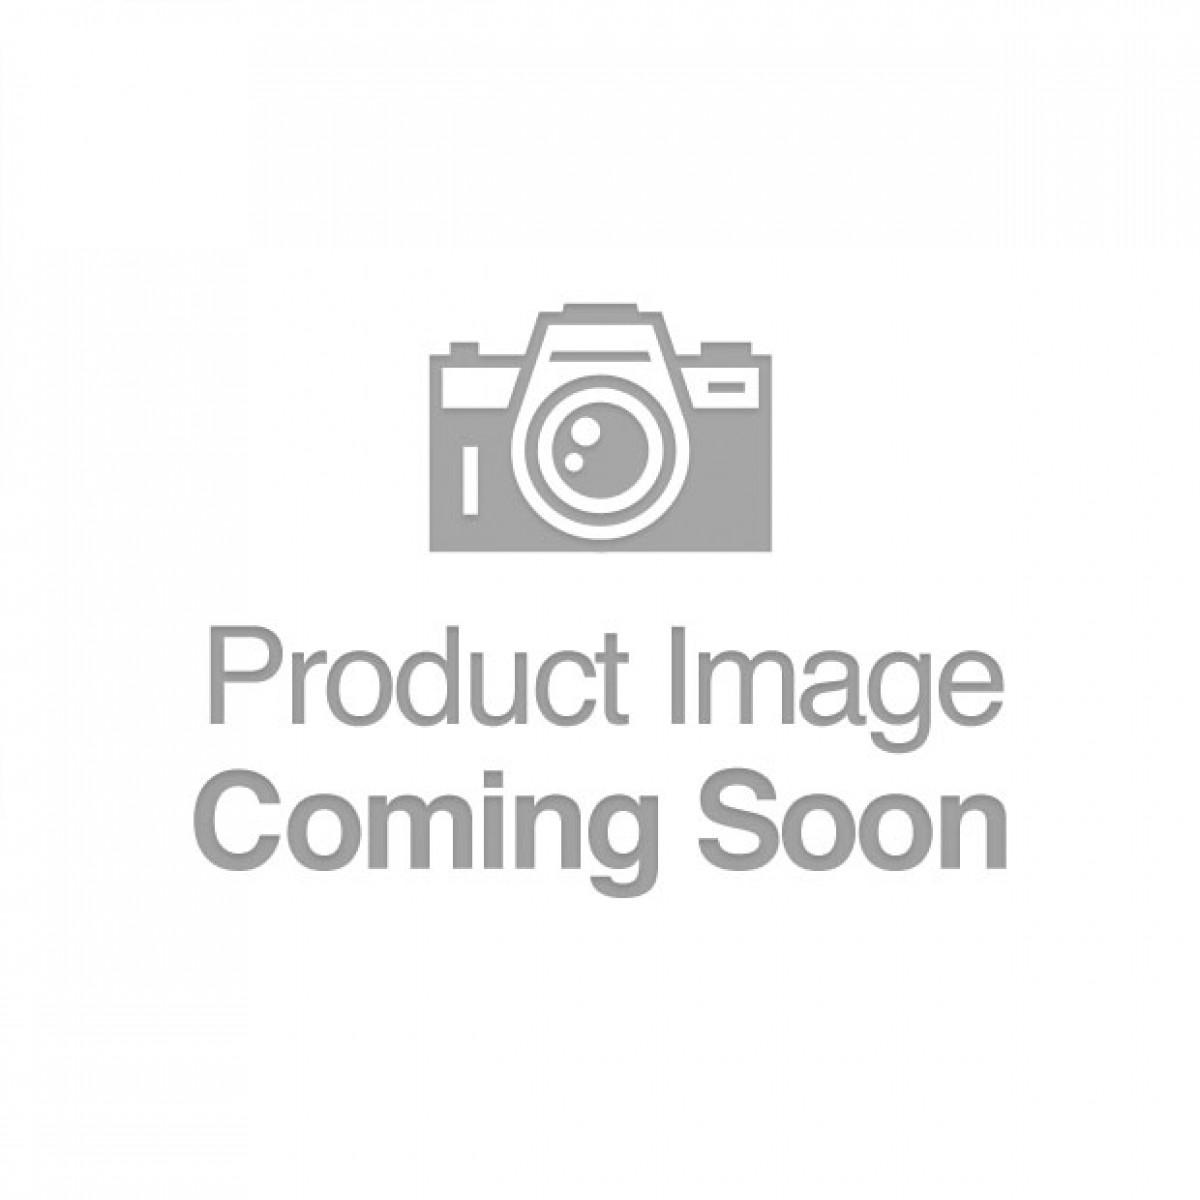 Rear Assets Mulitcolor Medium - Clear